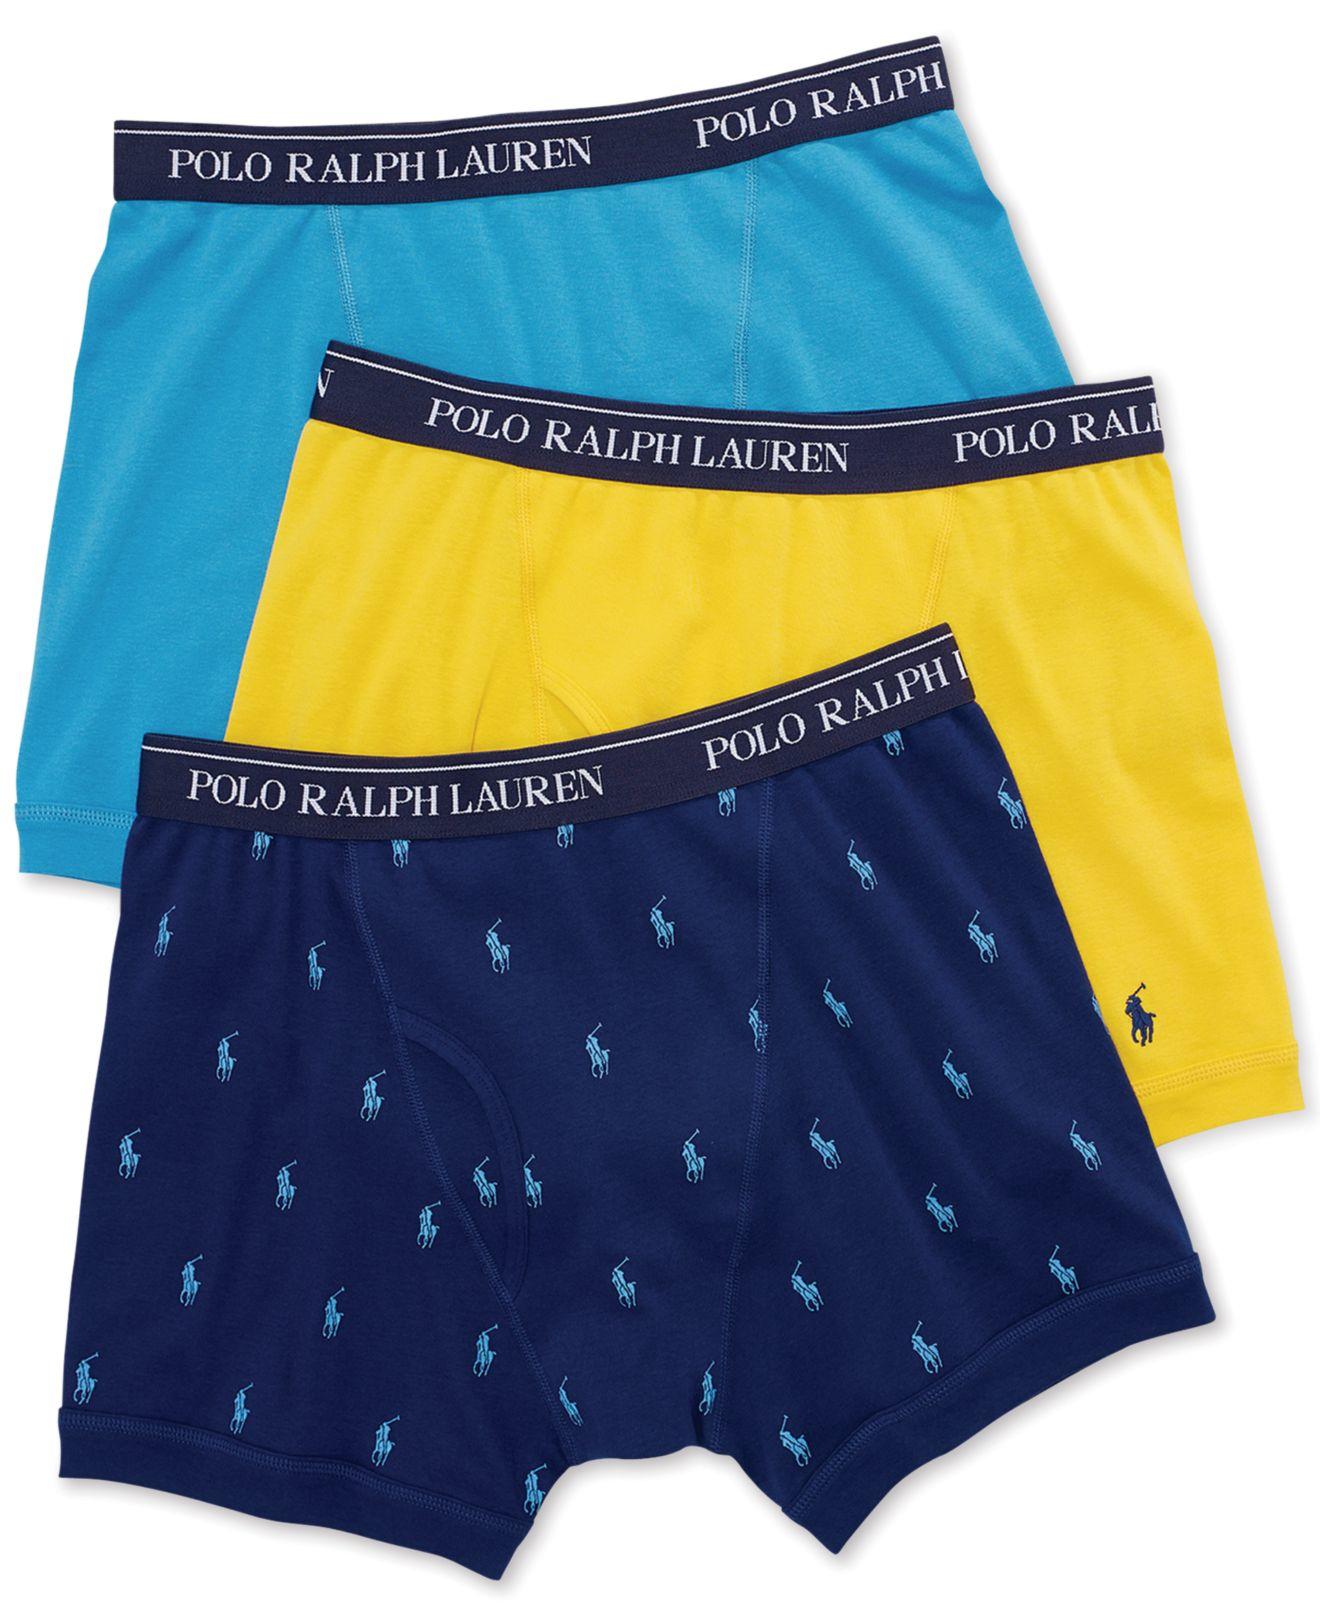 polo ralph lauren three pack cotton boxer briefs in blue